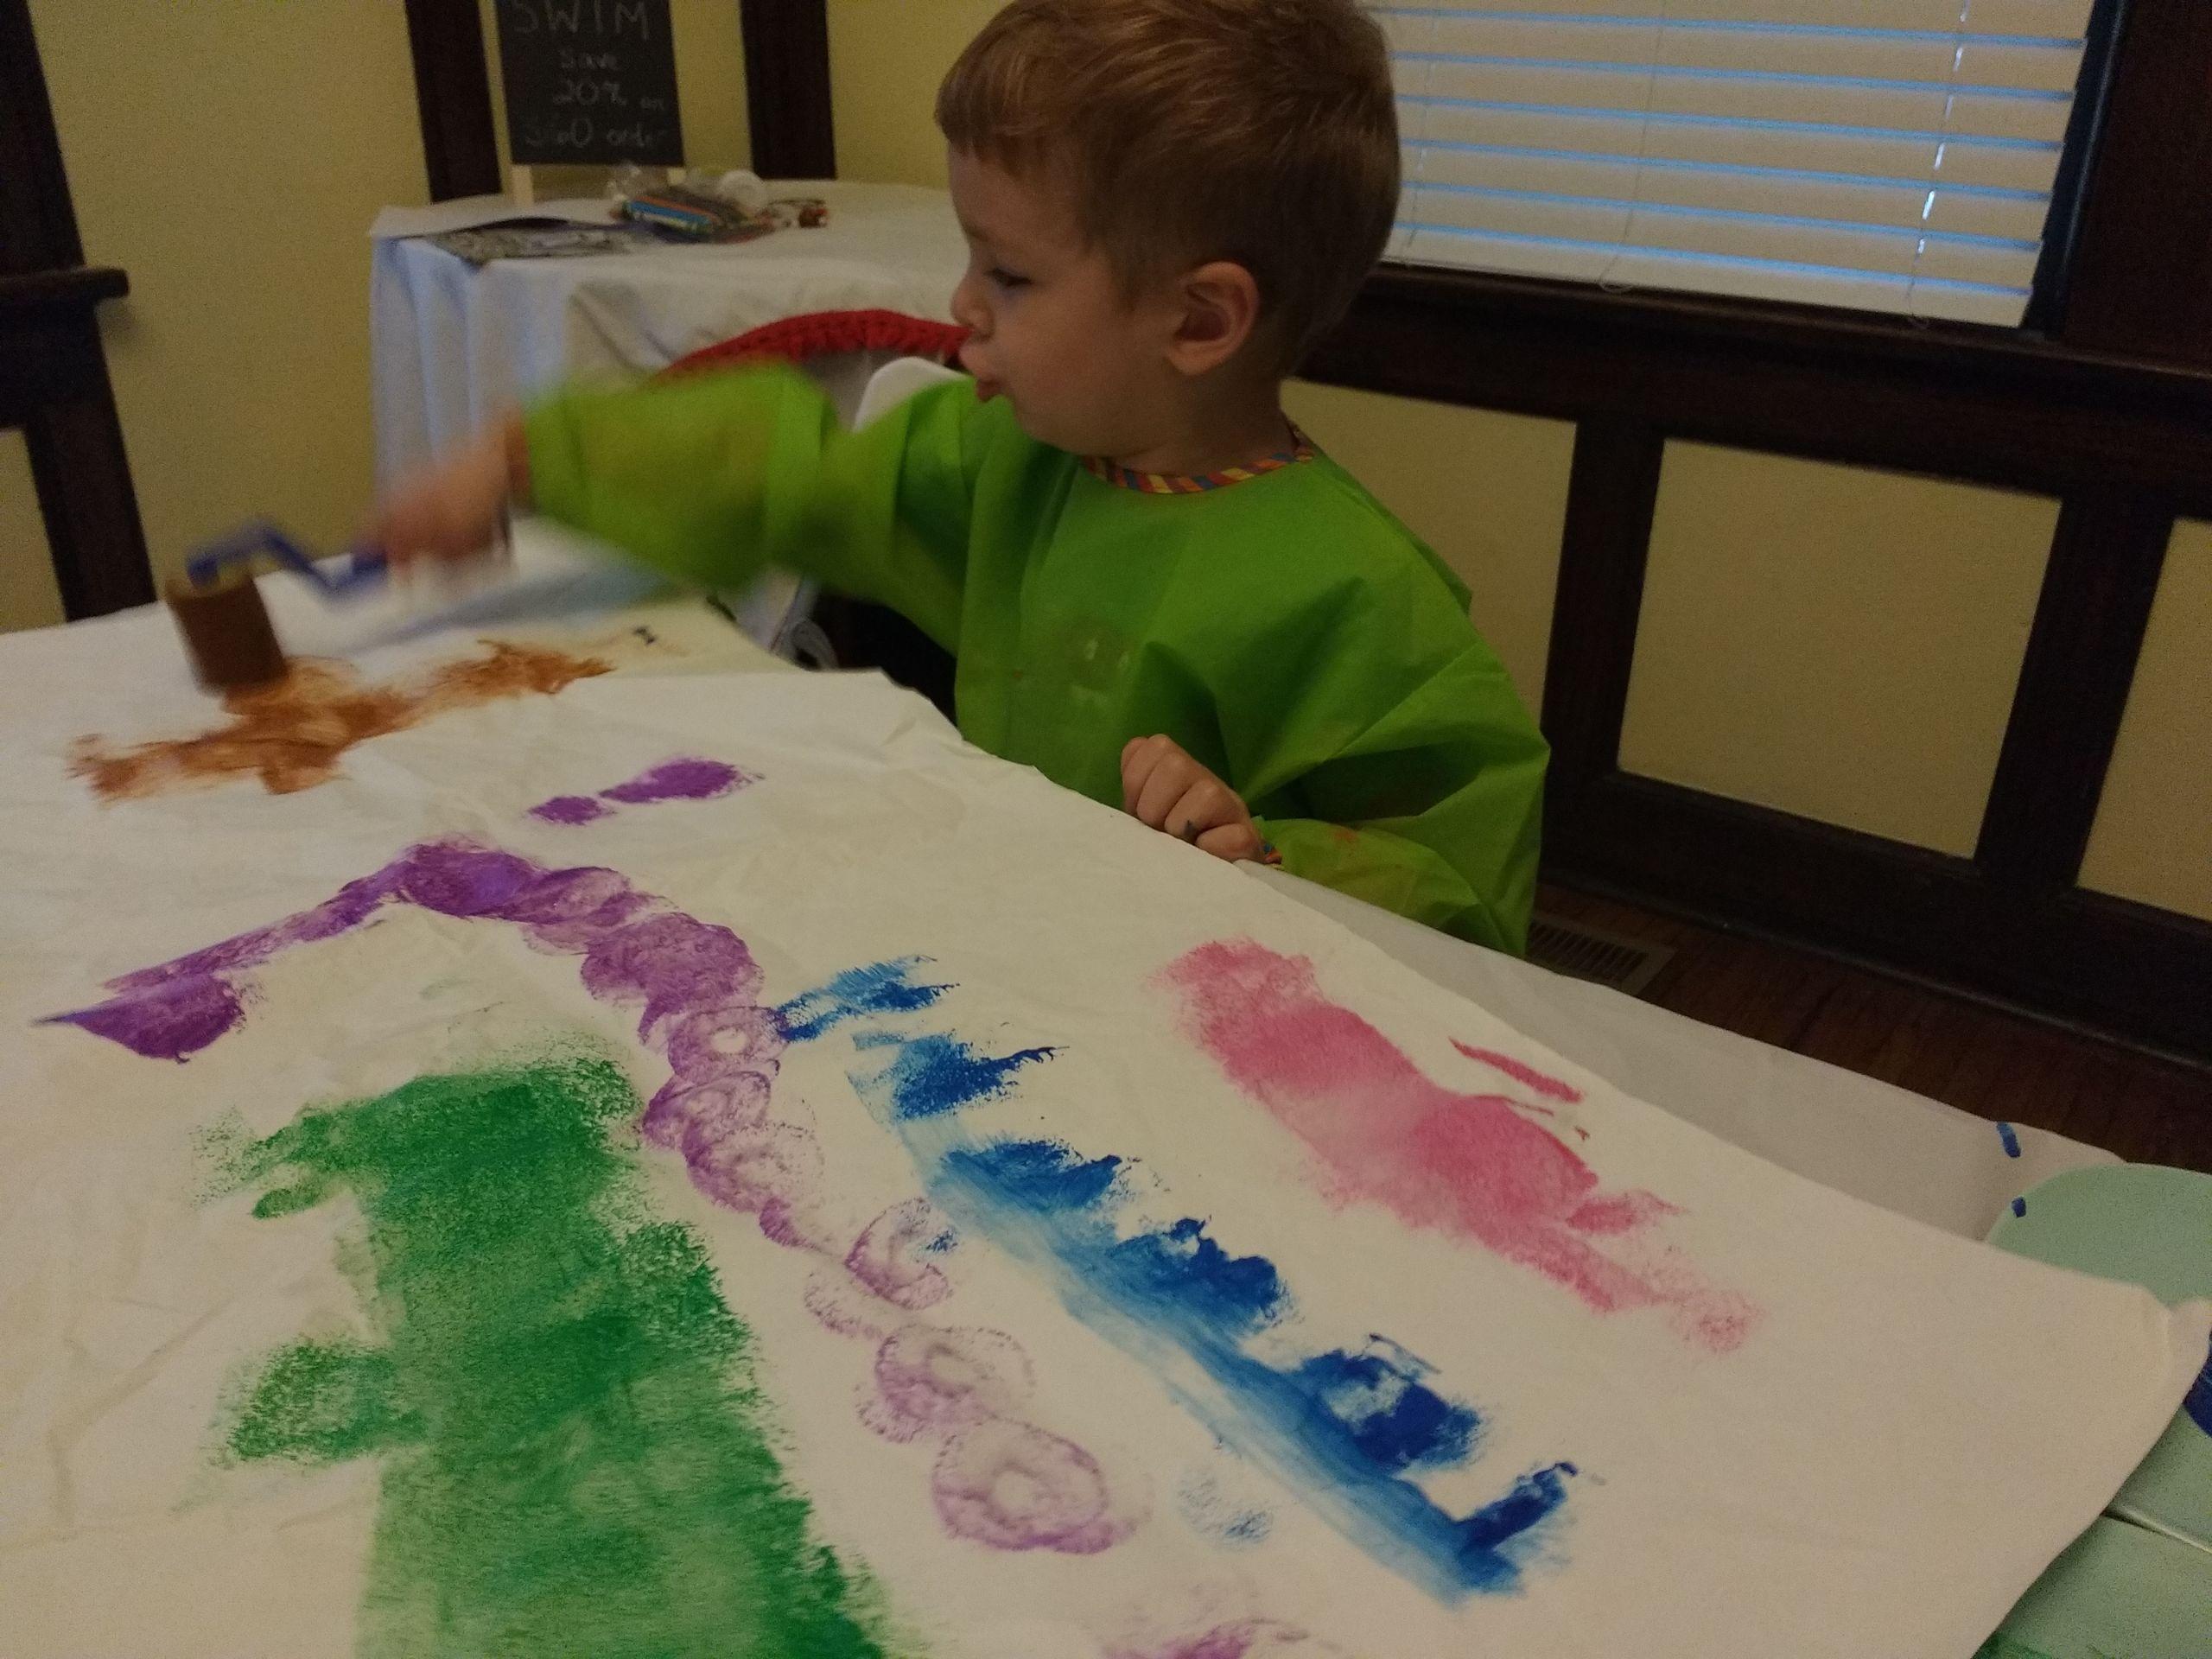 Paint Ideas For Preschoolers  Nine Easy Process Art Painting Ideas for Preschoolers